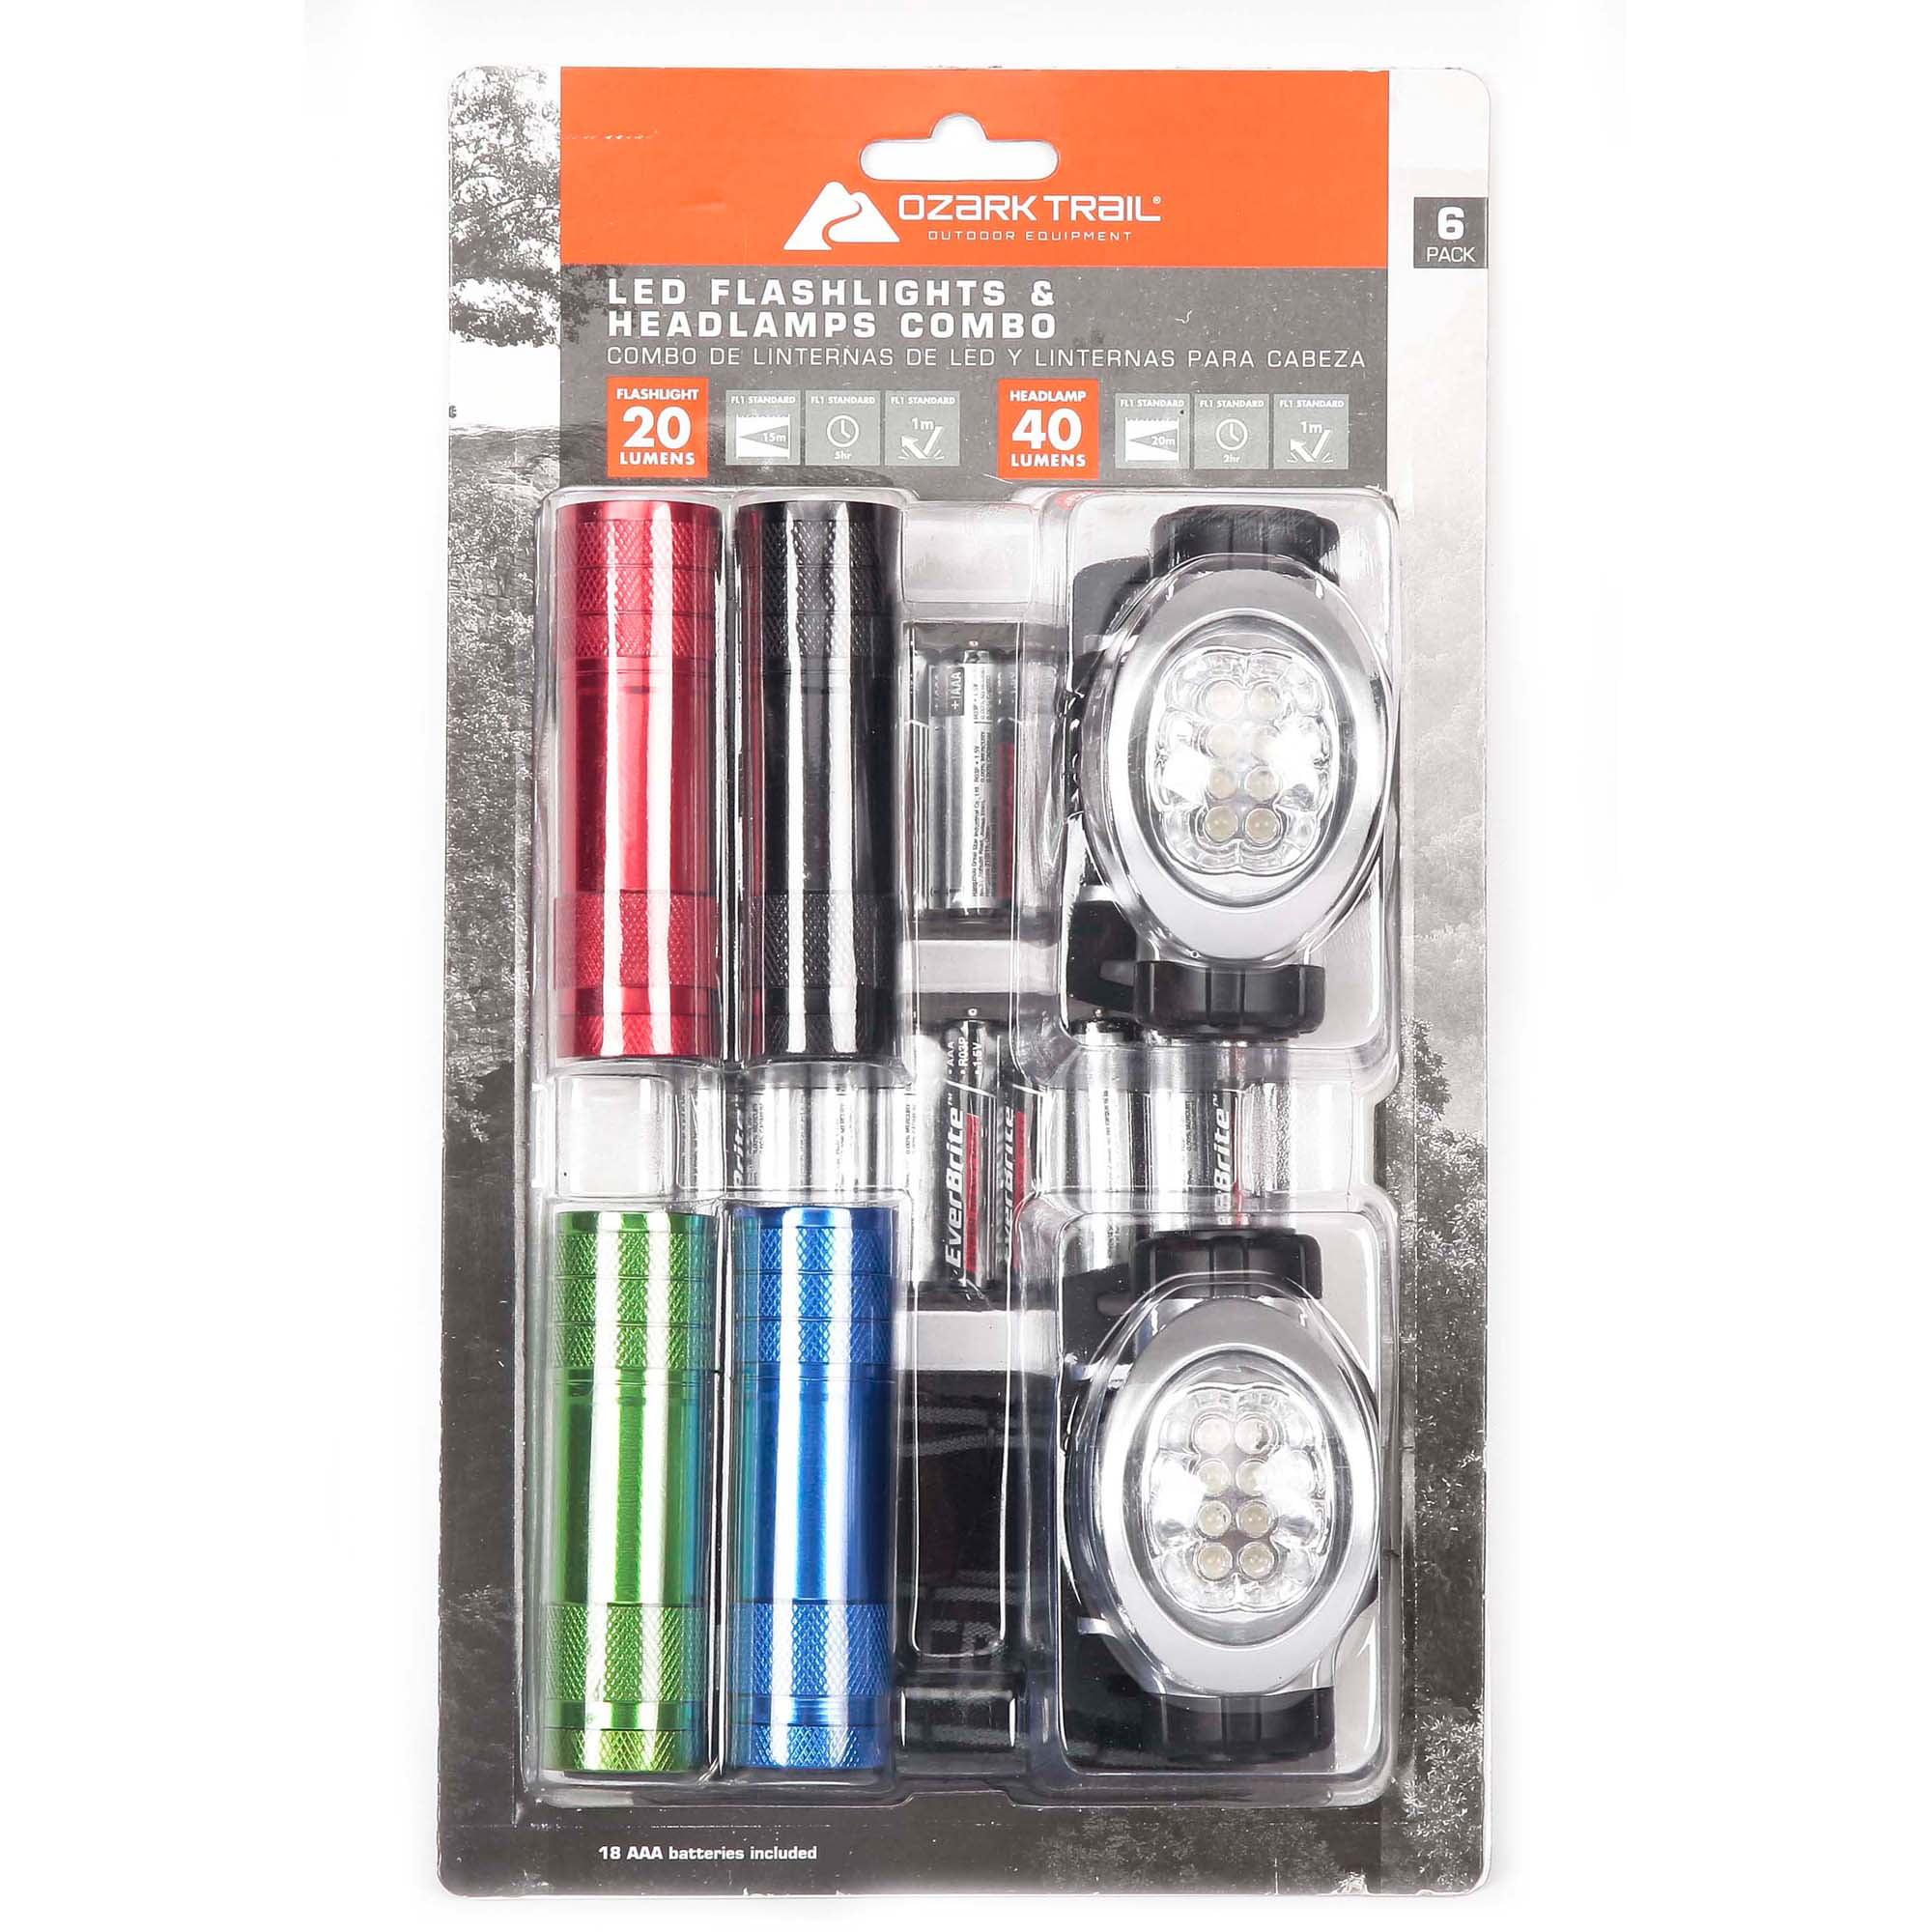 Ozark Trail LED Flashlight and Headlamp Combo, 6-Pack